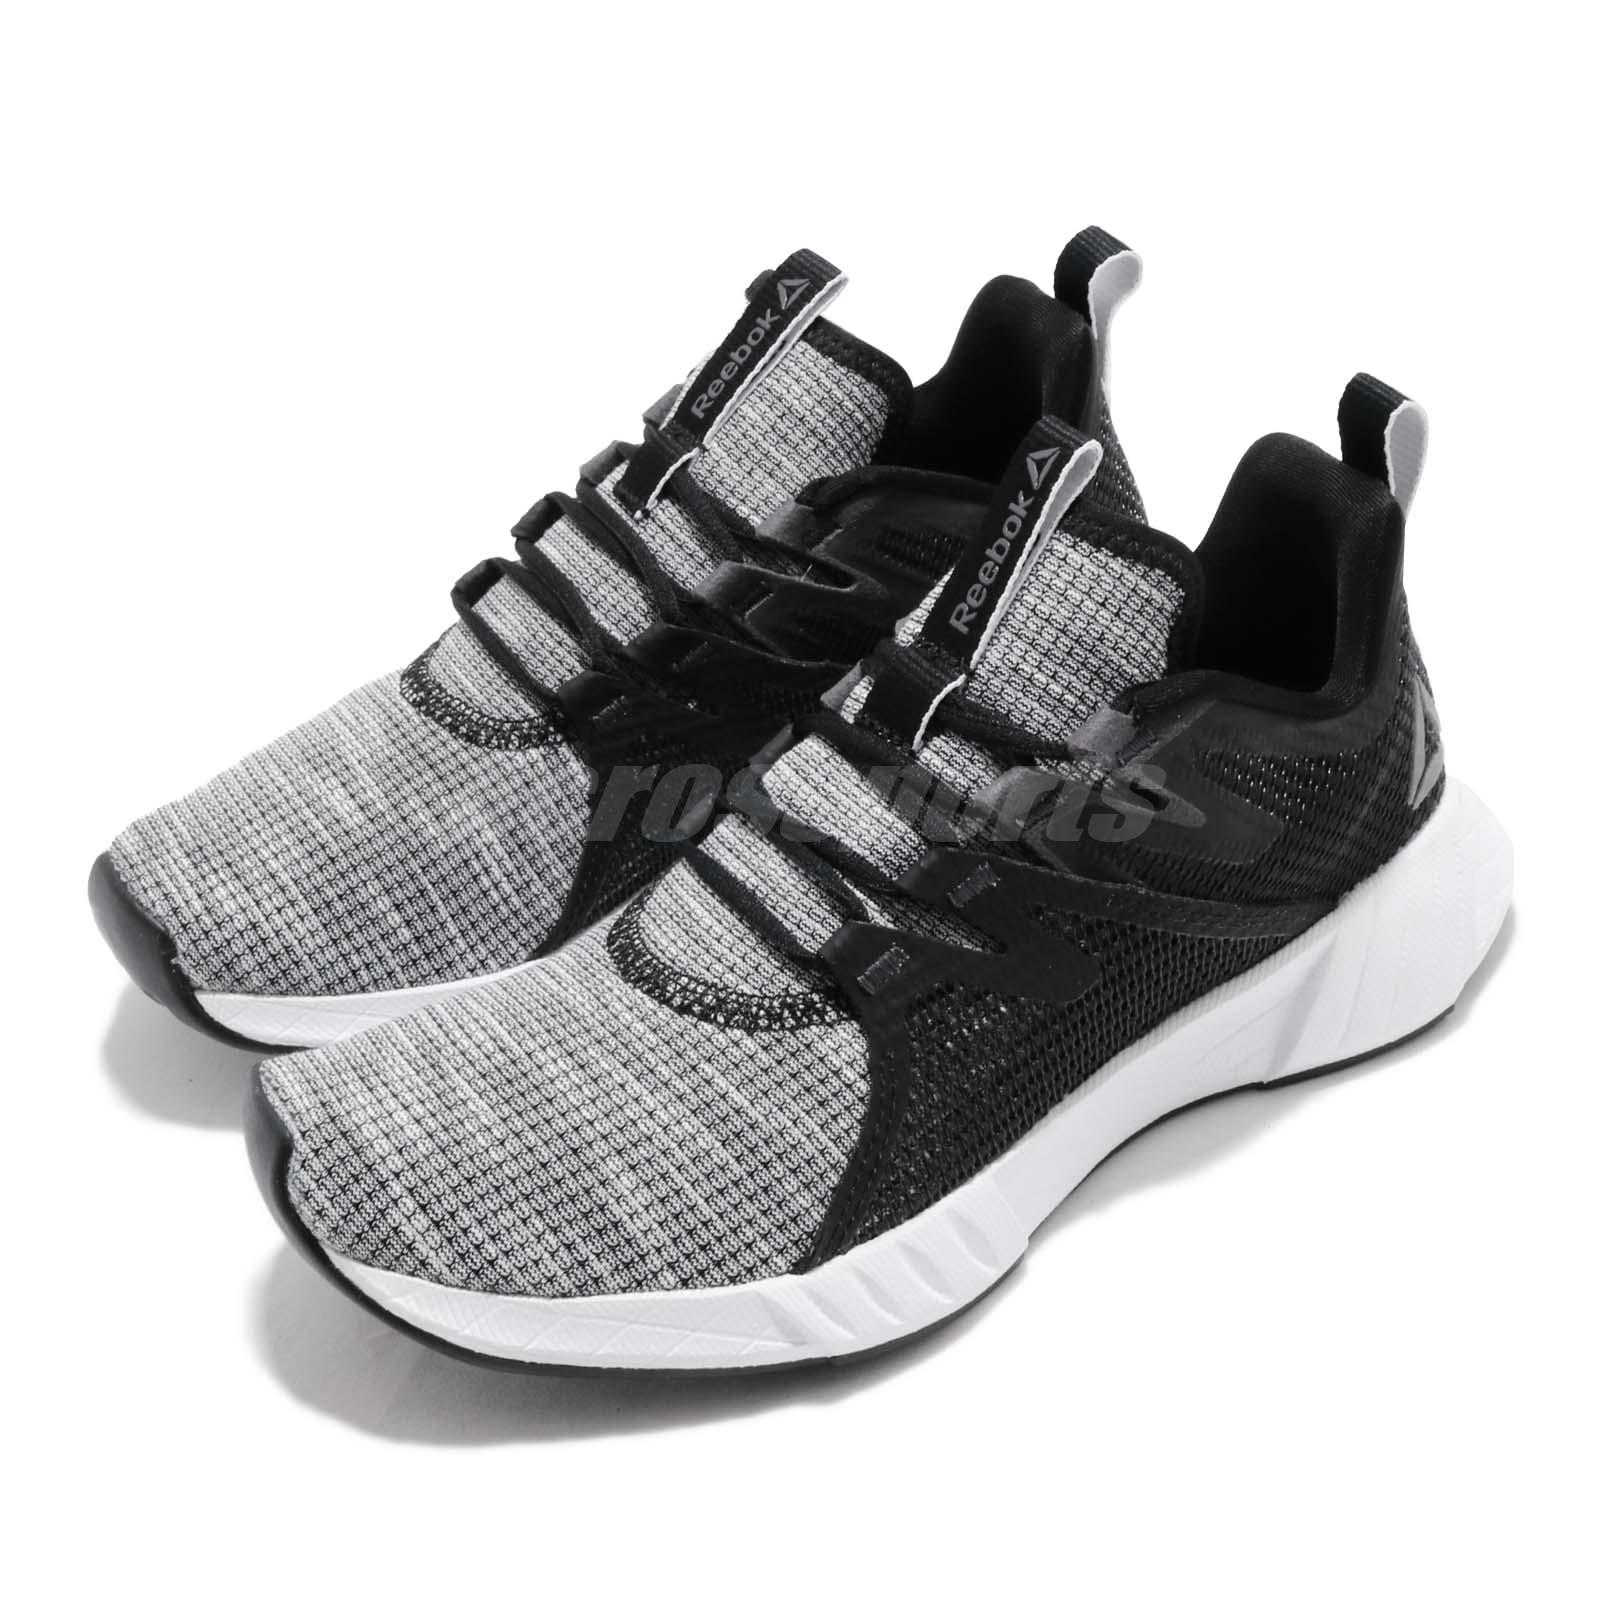 b9377ef2da Details about Reebok Fusium Run 2.0 Black Grey White Women Running Casual  Shoes Sneaker CN6390